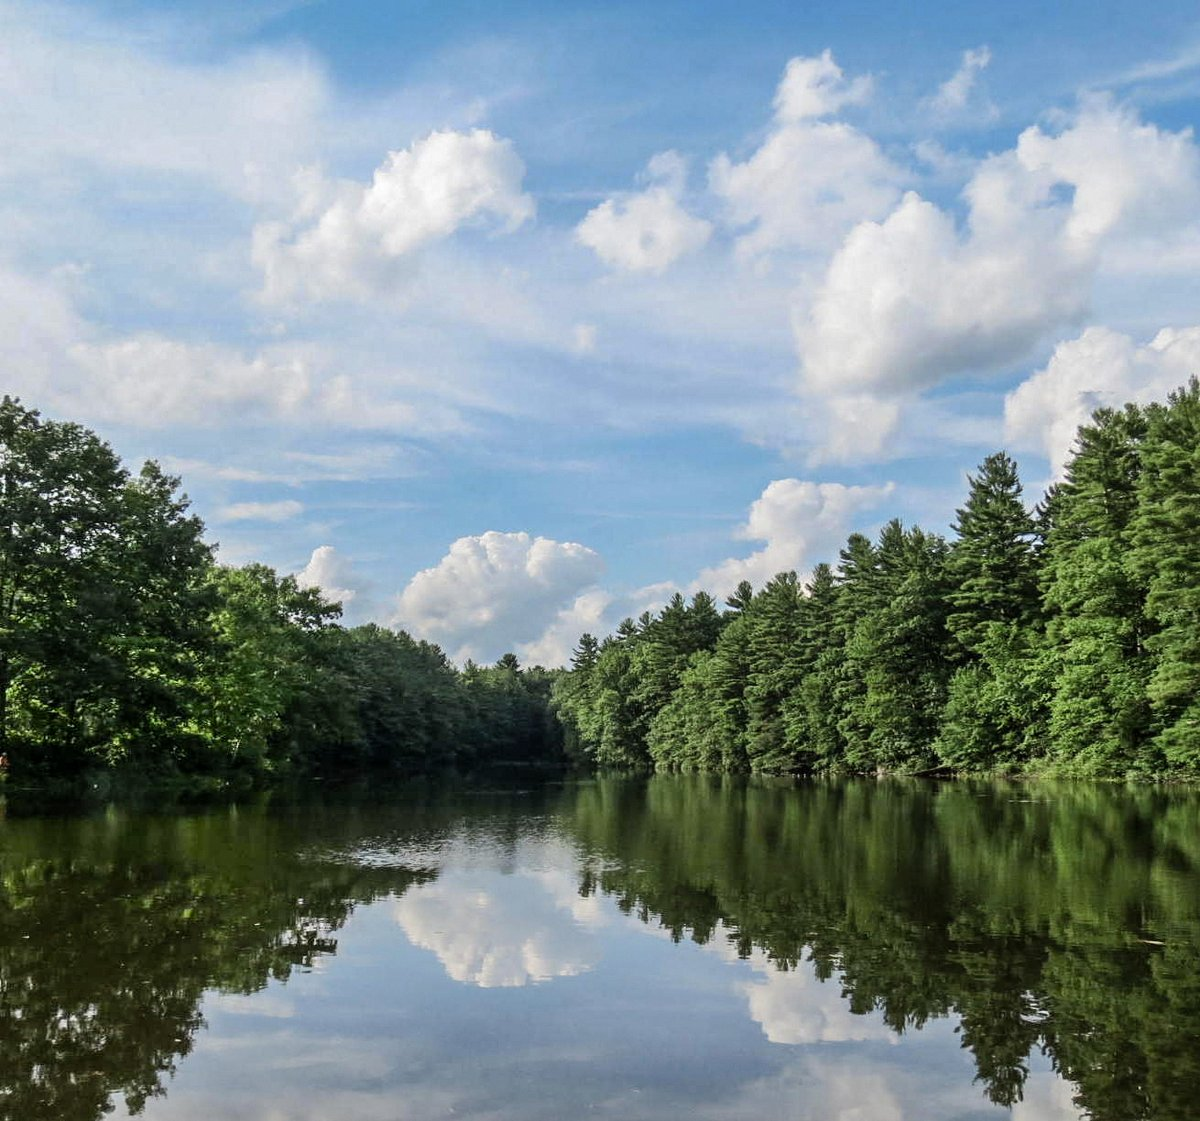 5. Pond View